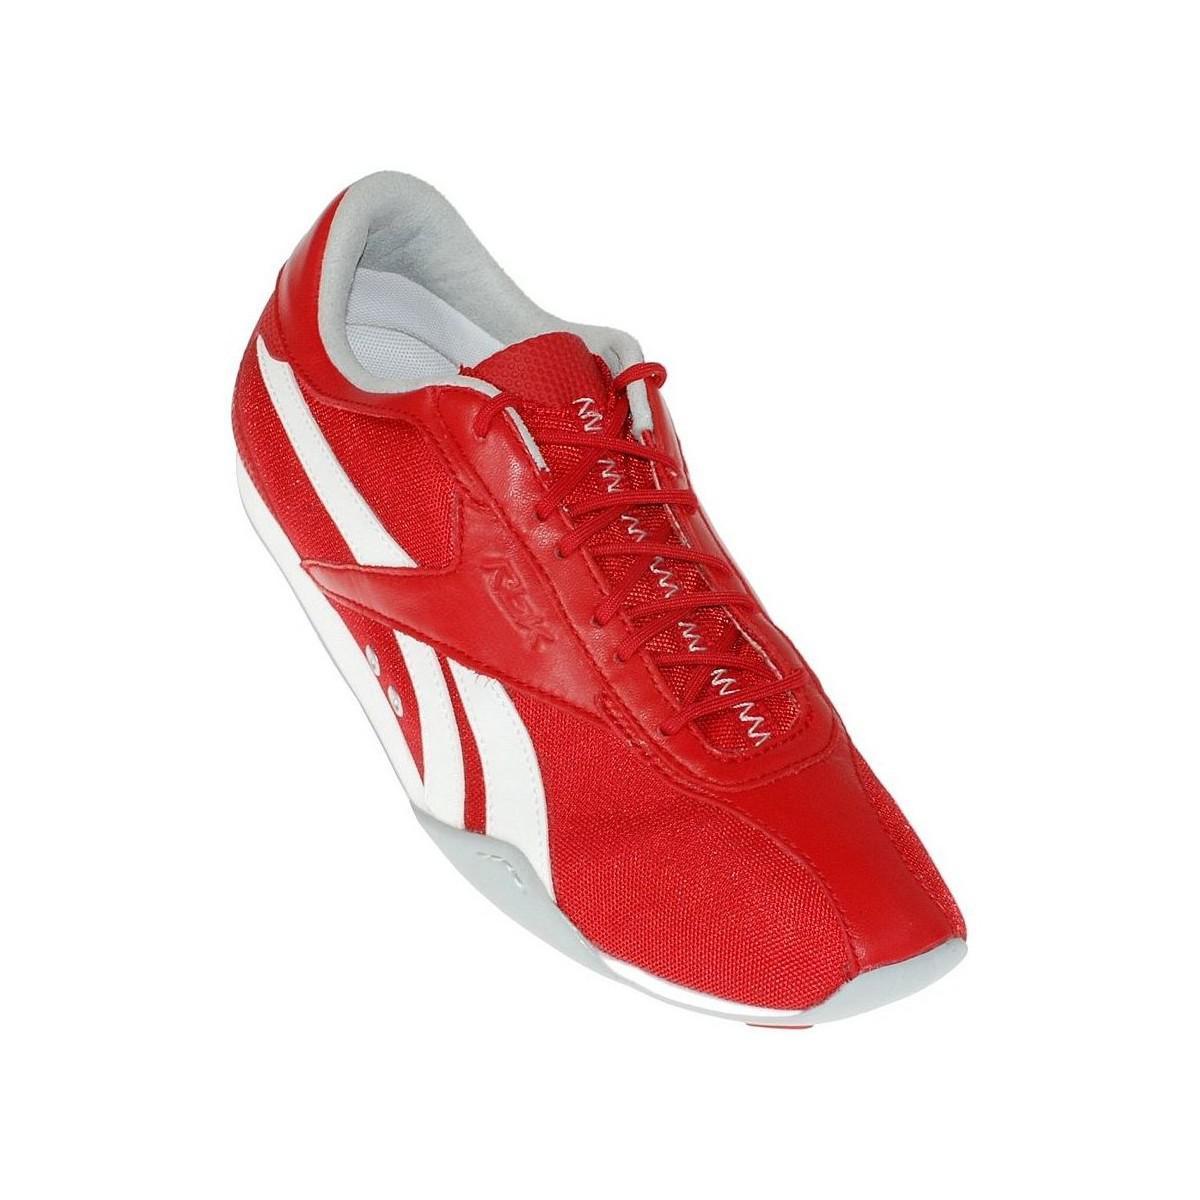 Reebok Sport Chaussures Starboard Reebok Sport TBS Maline bhw5ZK4c